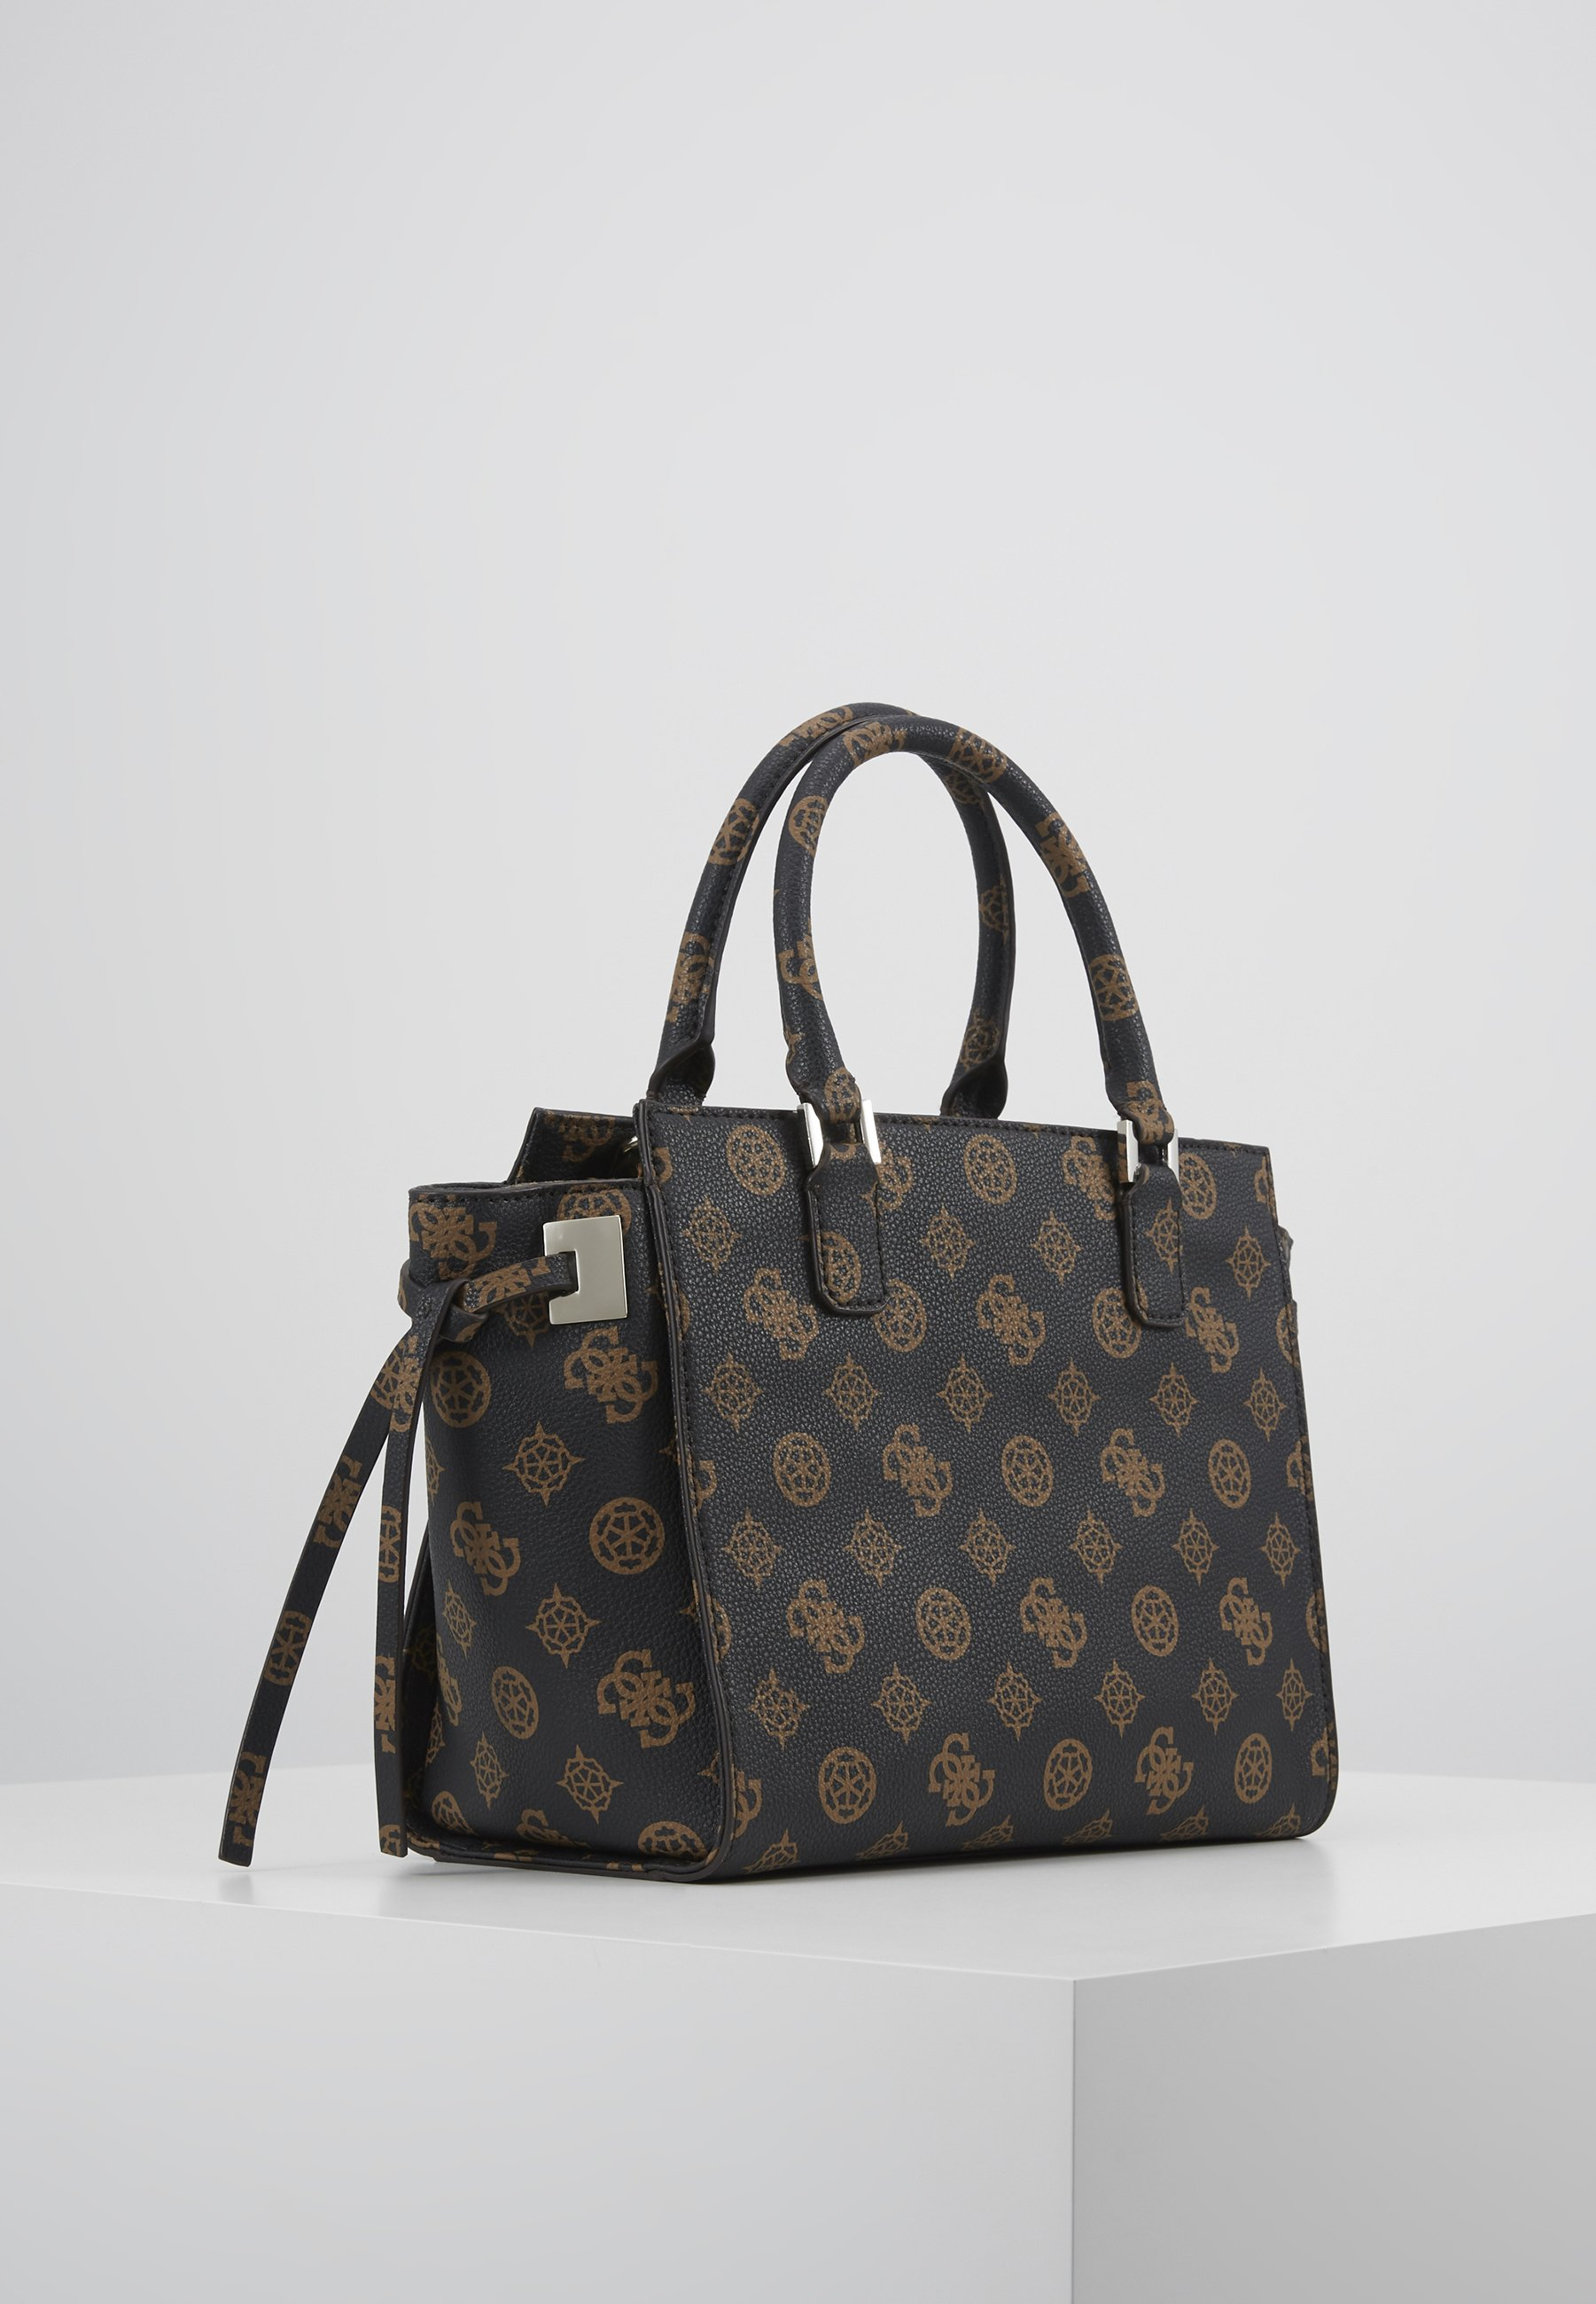 Best Place Latest Accessories Guess DIGITAL STATUS SATCHEL Handbag brown xo84I1vu0 iHAJ0HVCR